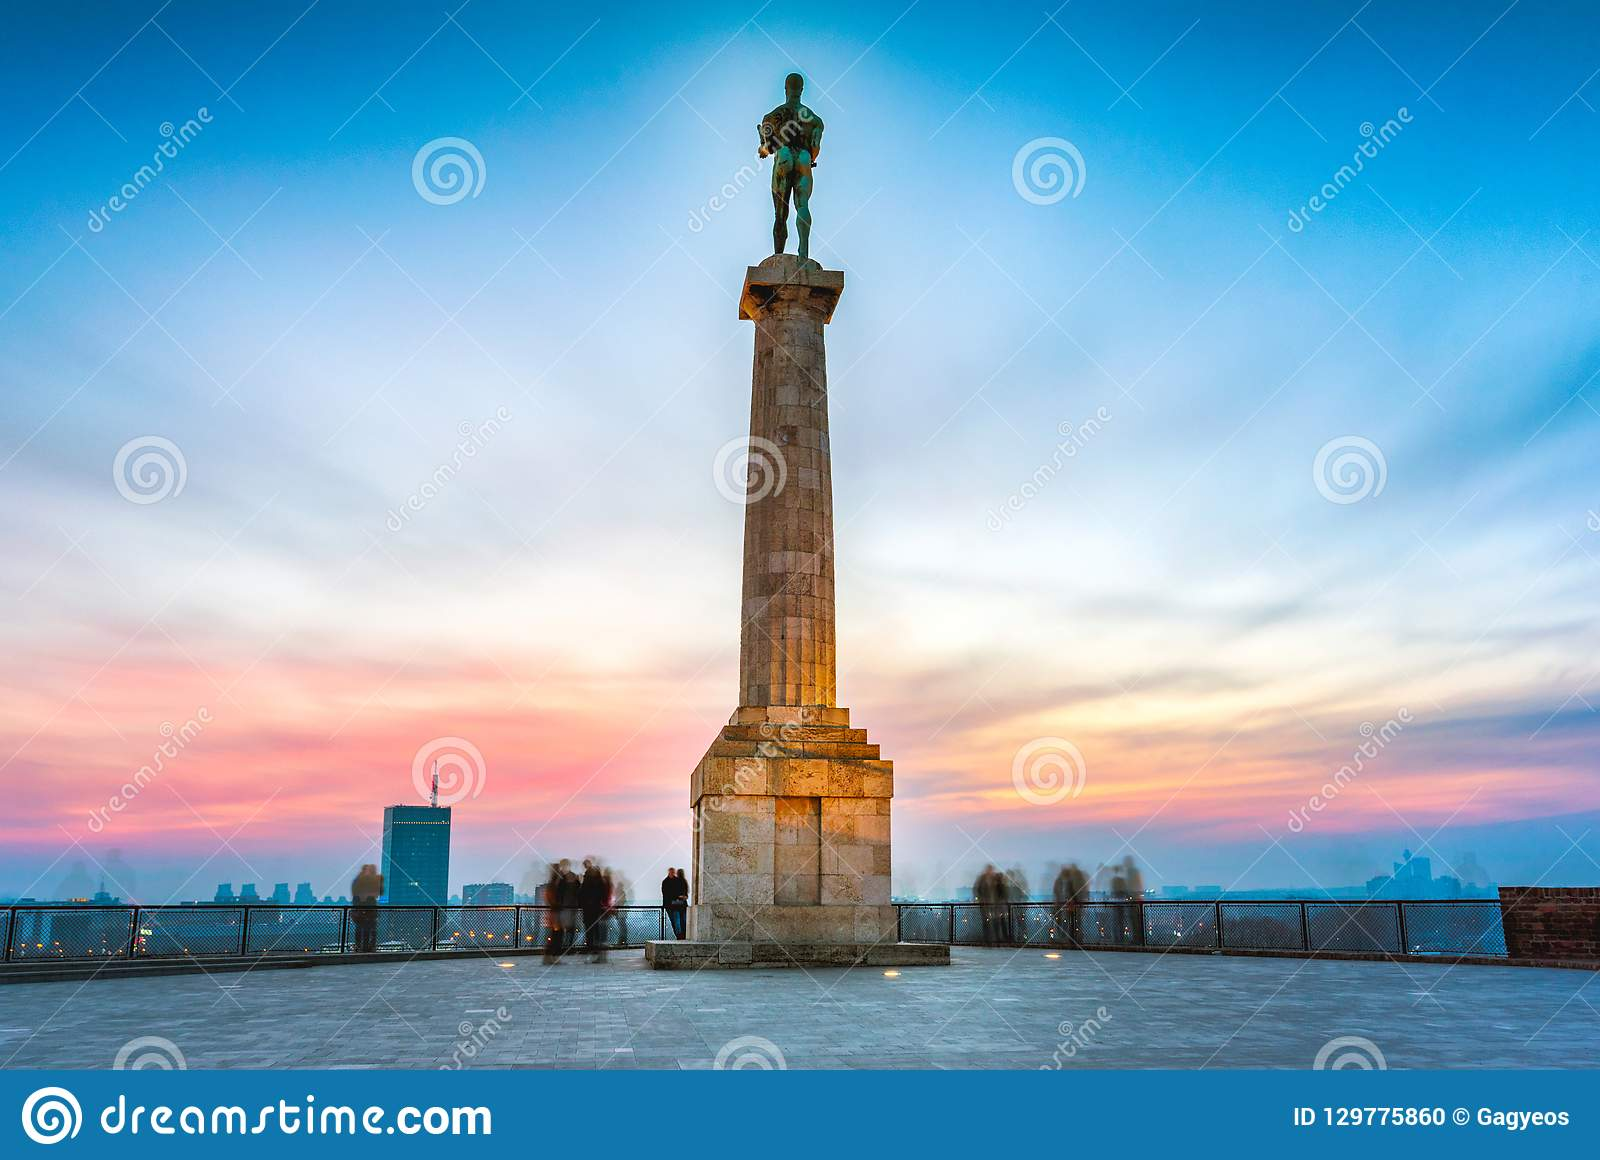 Belgrado al tramonto Statua di Pobednik